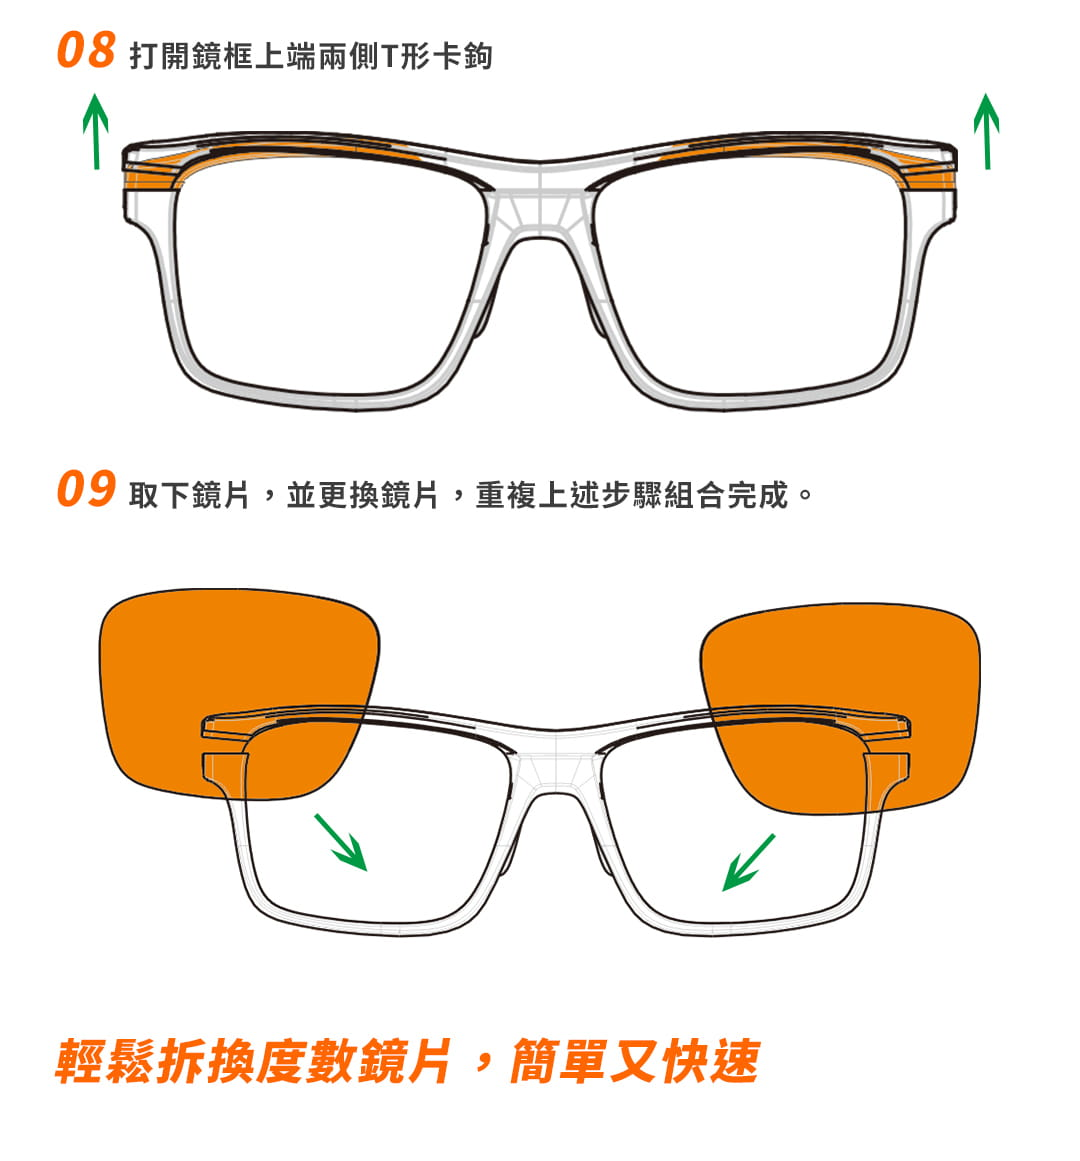 SABLE黑貂光學-專屬球類運動眼鏡CP-823(標準款-無保護墊)+SP-03(平光精緻鍍膜鏡片) 6